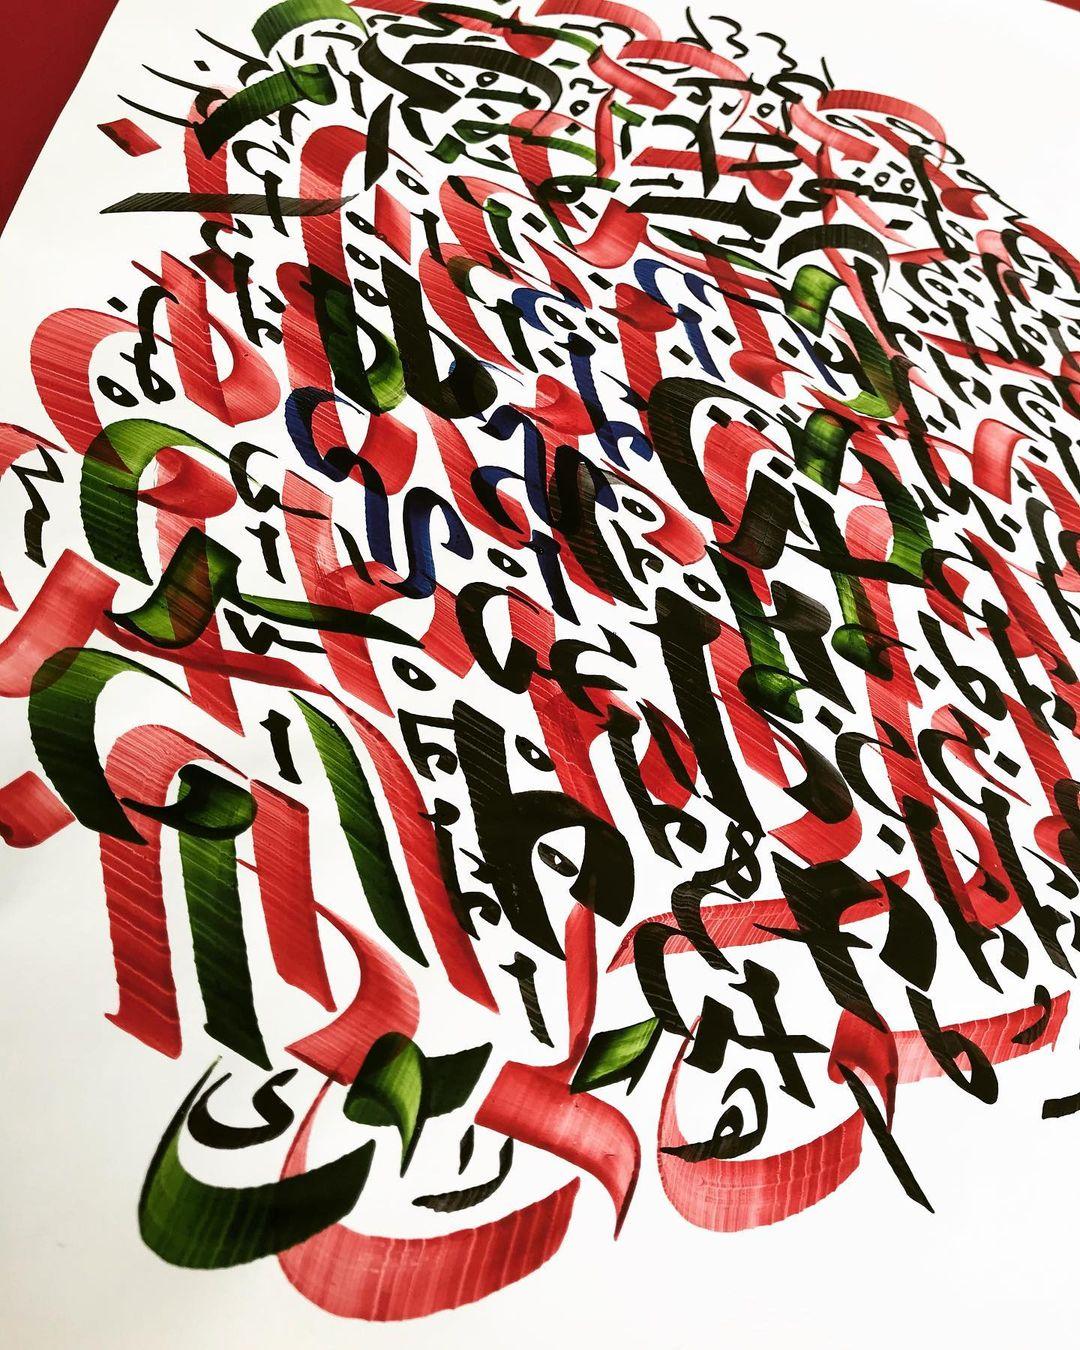 Donwload Photo #exercise #arabiccalligraphy #islamiccalligraphy #tezhip #hüsnühat #hüsnihat ...- hattat_aa 2